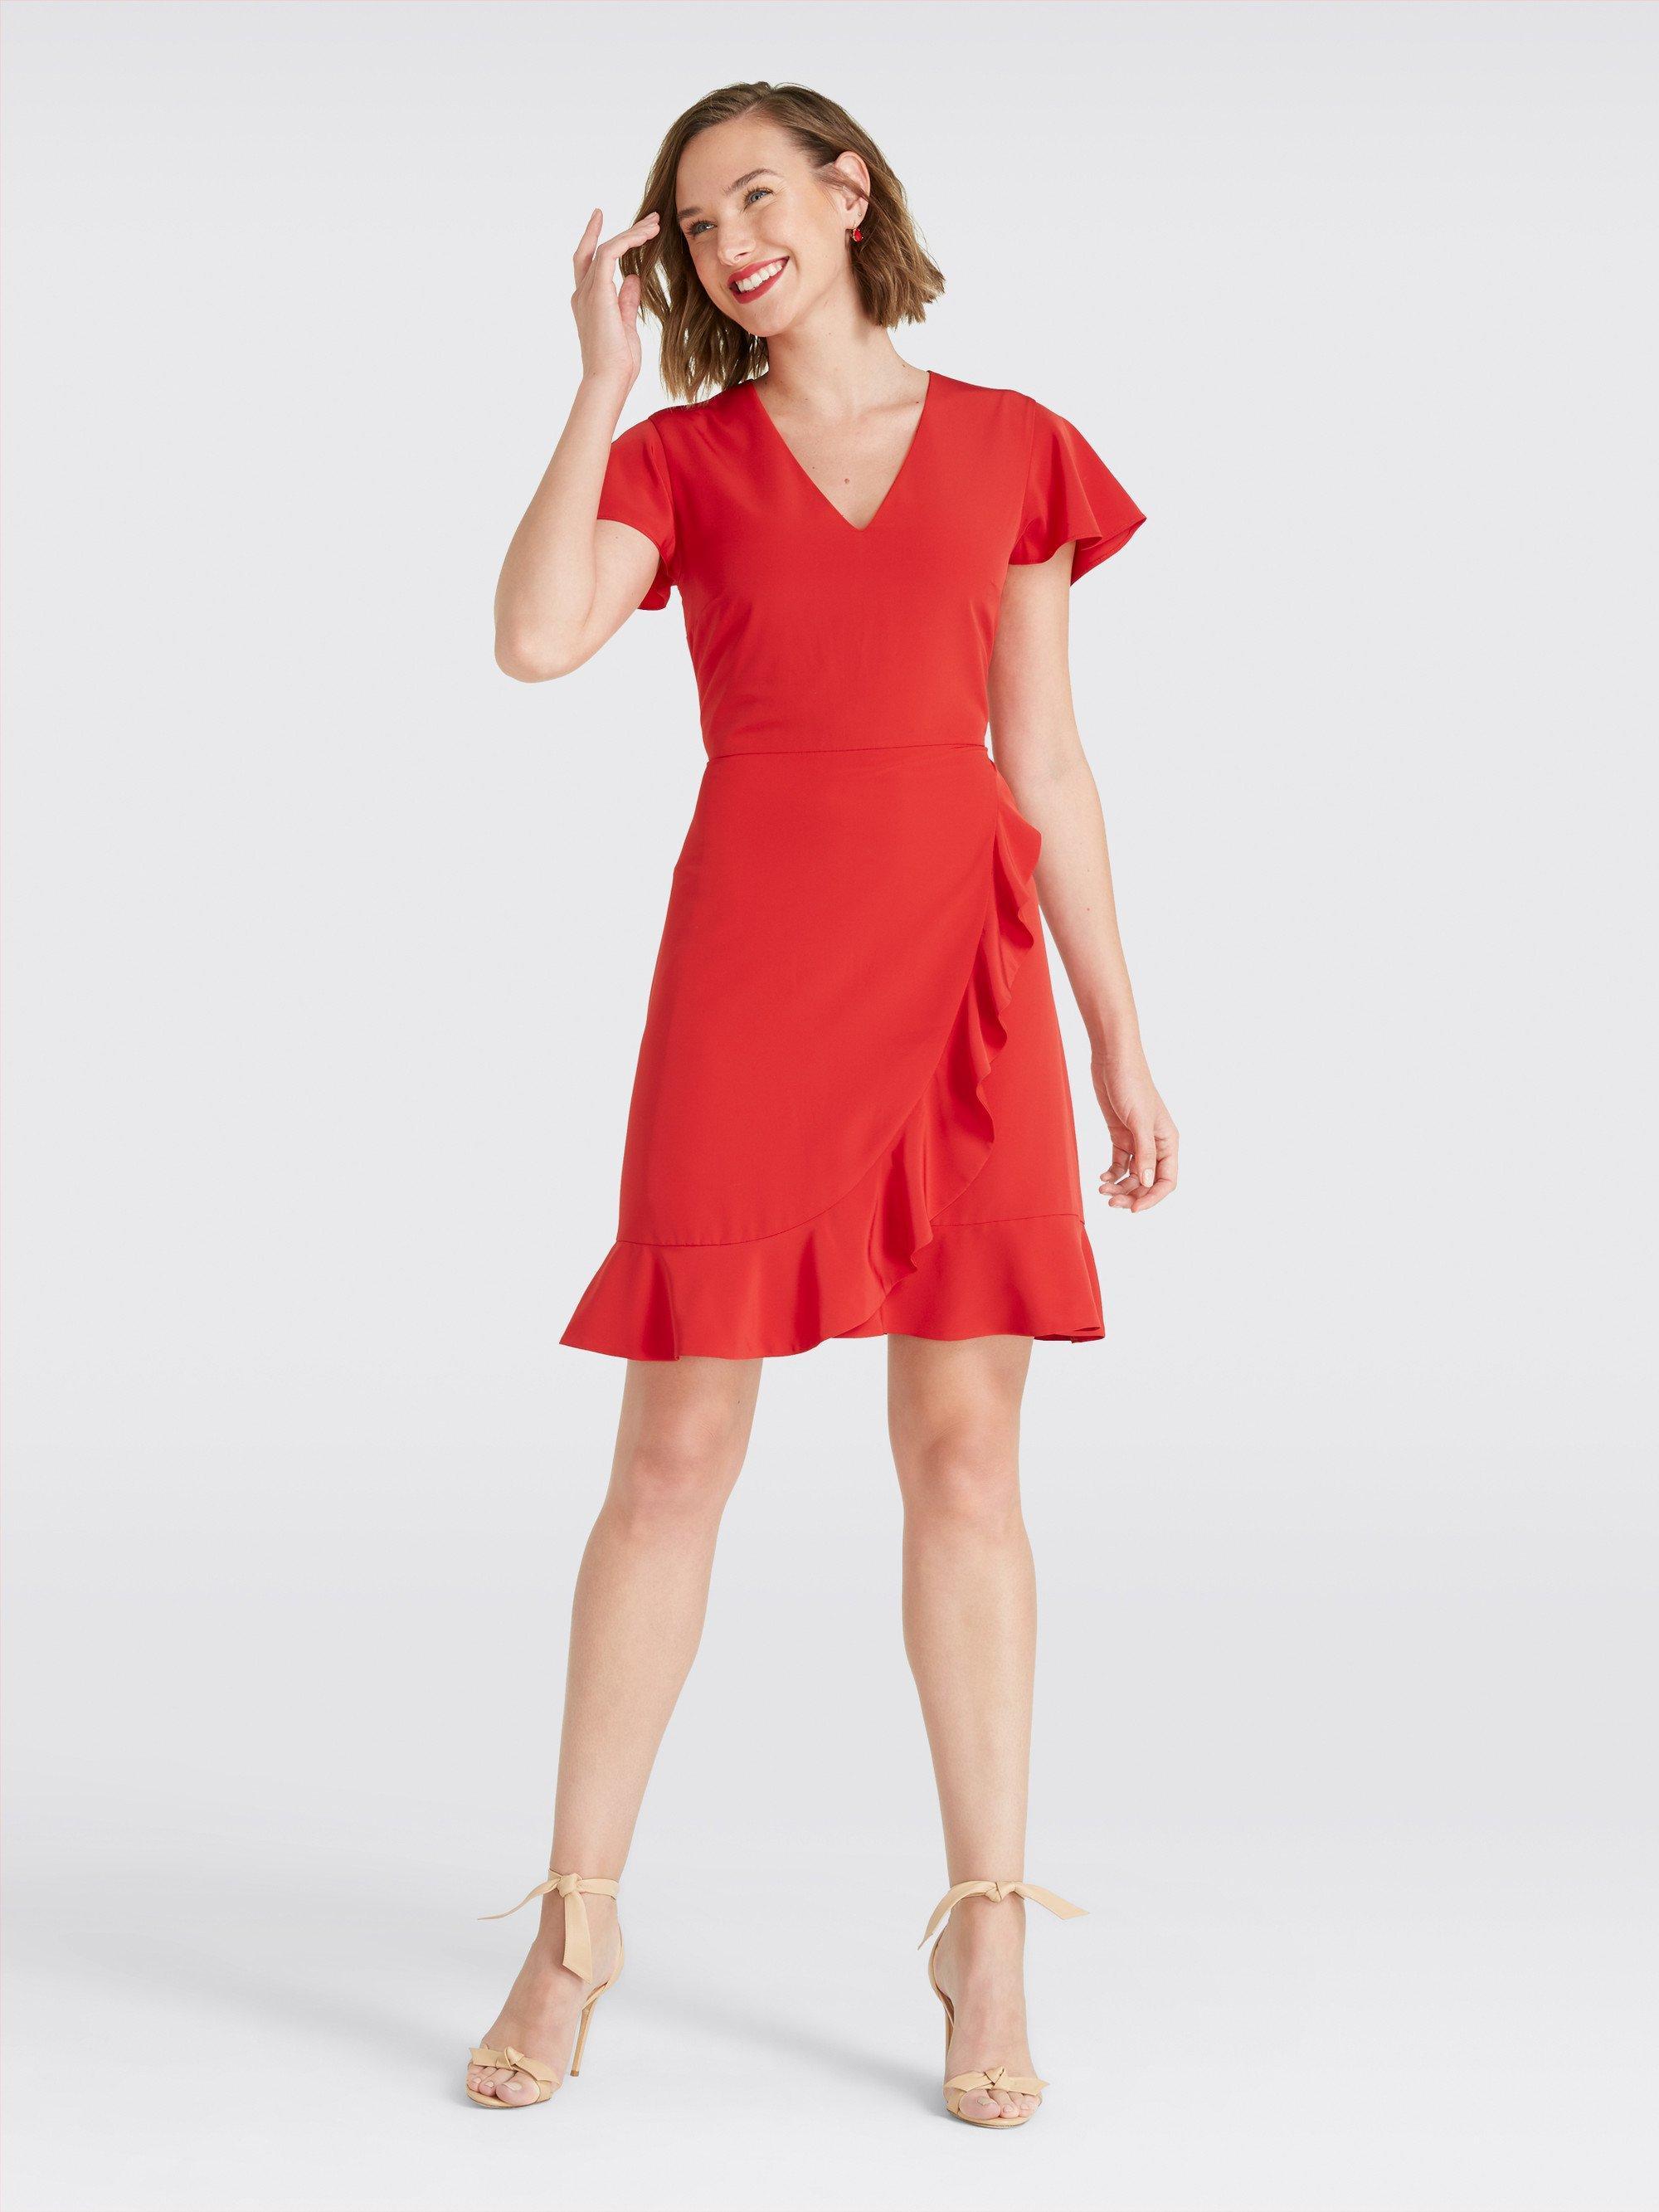 b7136b5544f Lyst - Draper James Solid Flutter Dress in Red - Save 19%